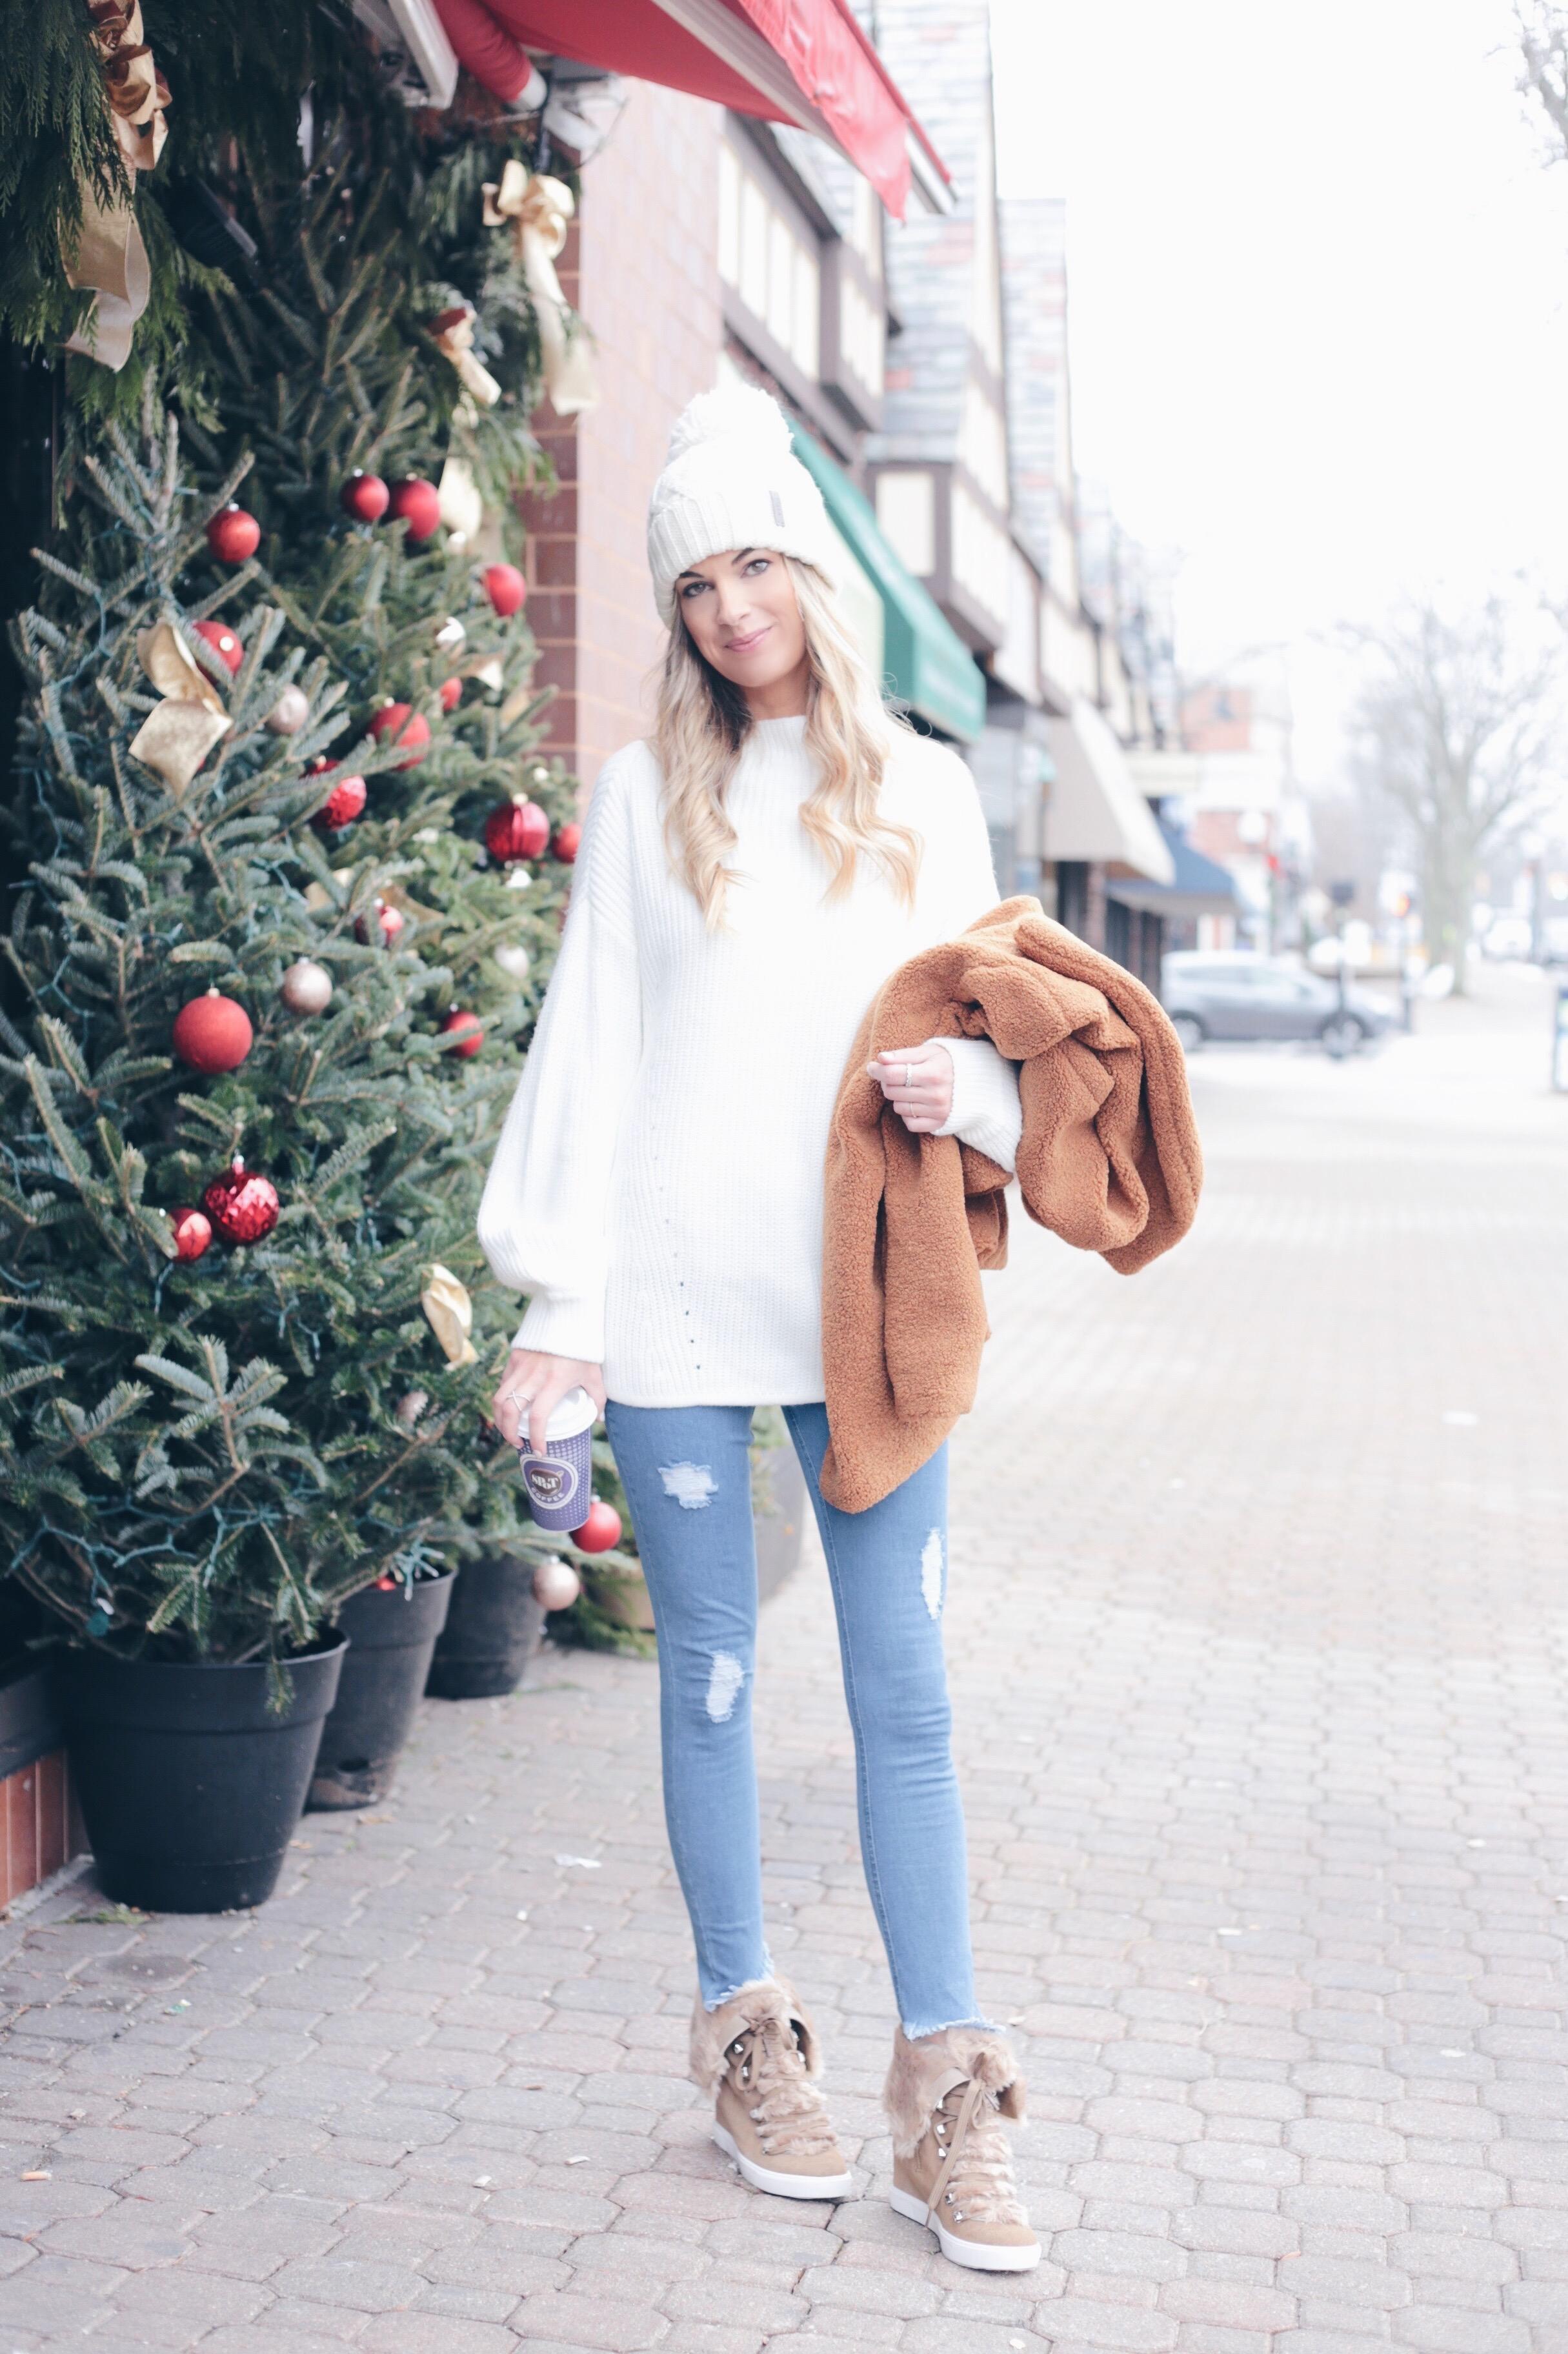 Teddy Bear Coat Outfit Ideas | Winter Style Blog